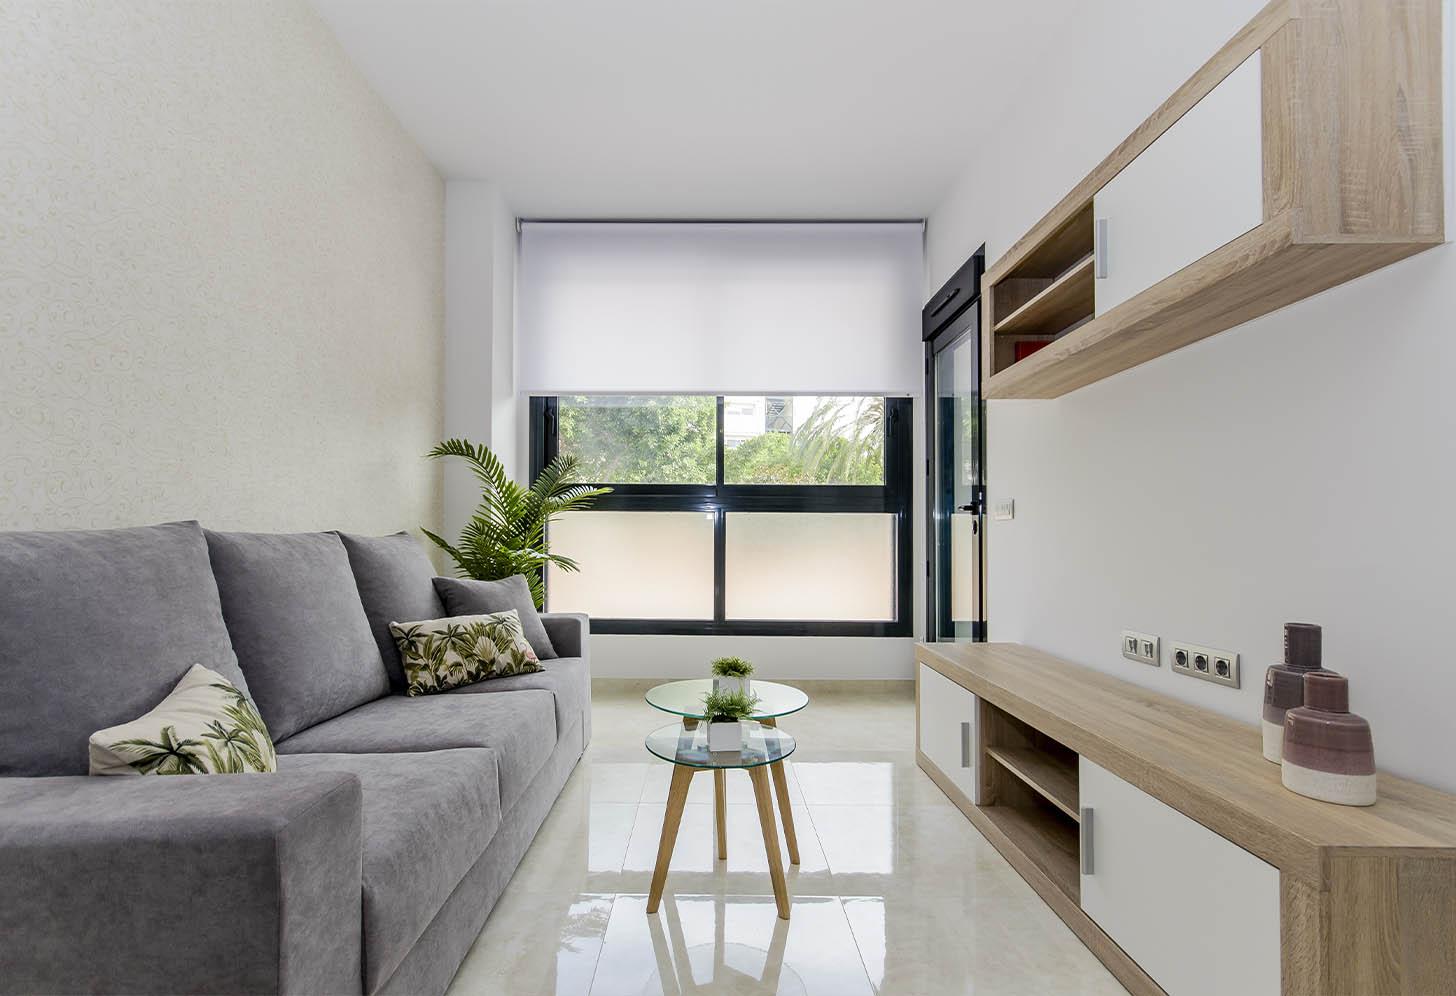 immobilier neuf espagne costa blanca on-p2 cibeles salon 2